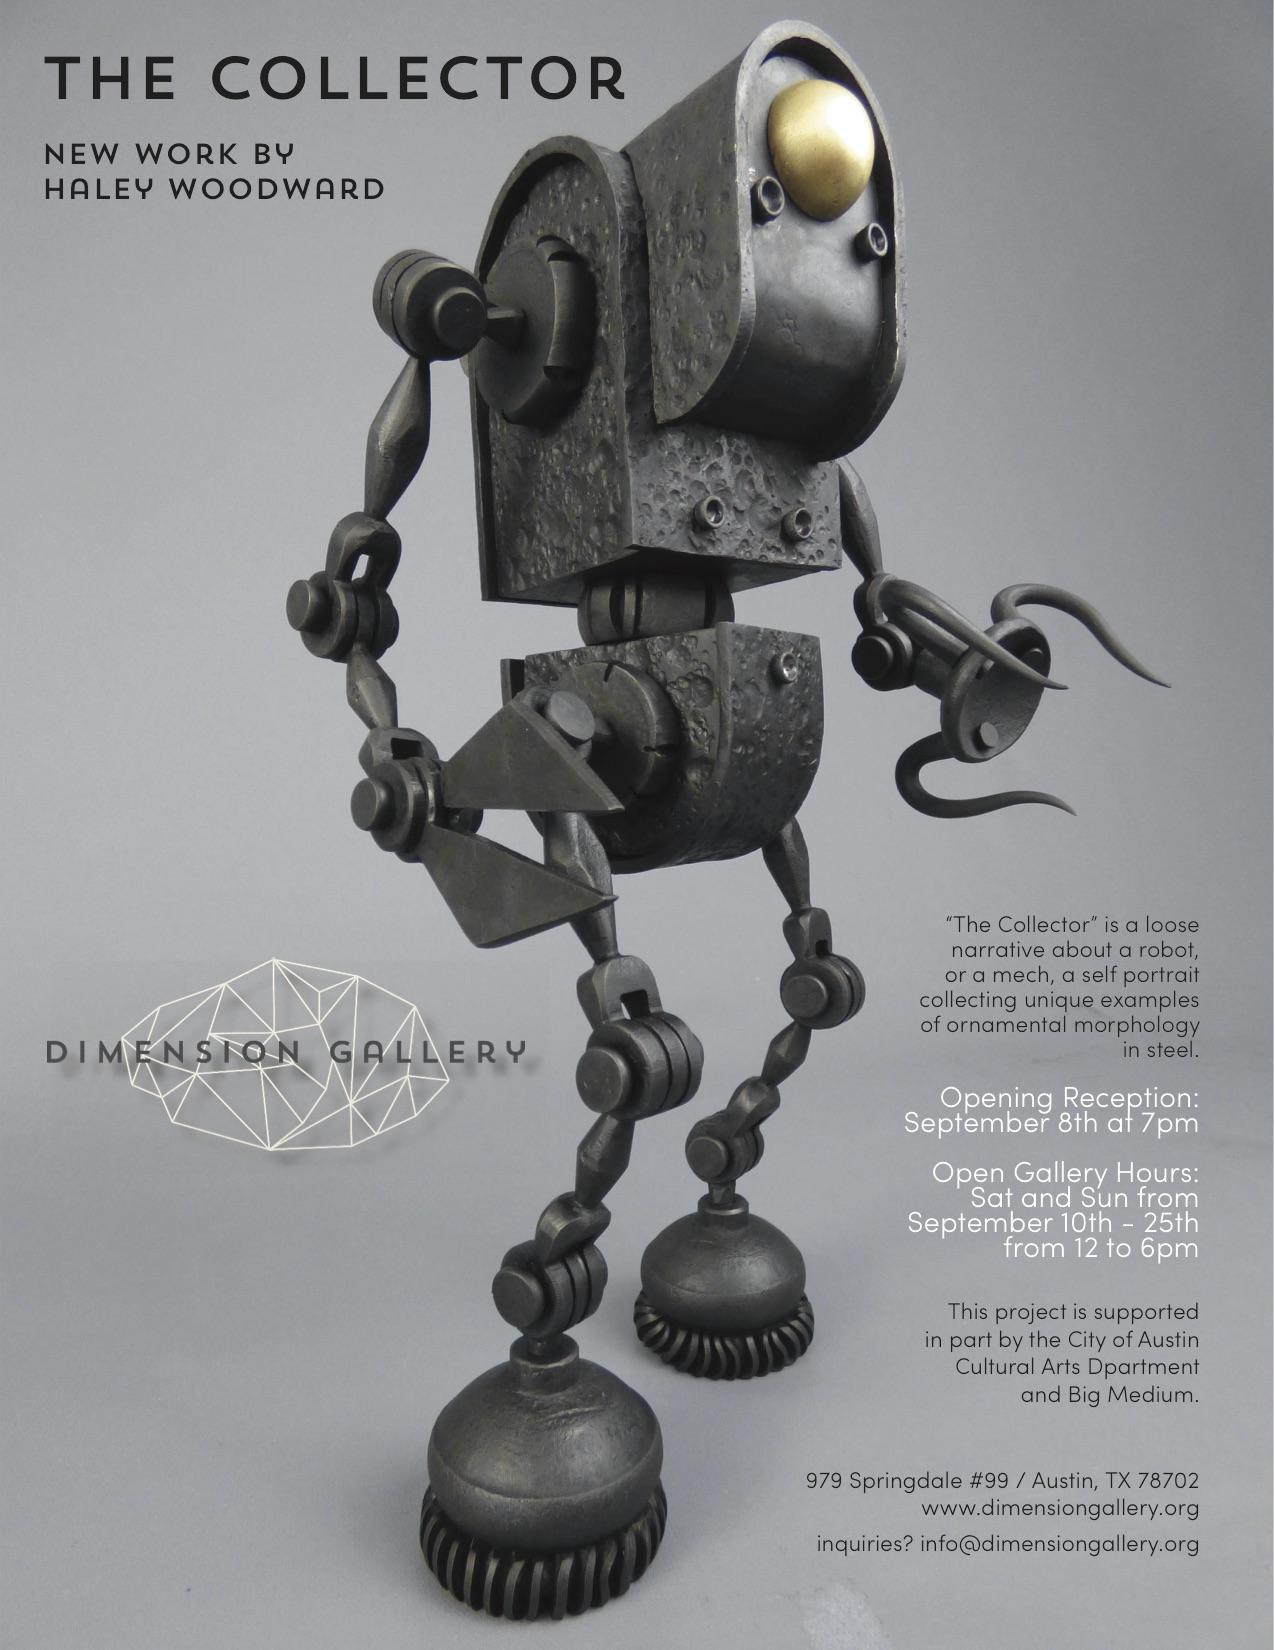 Cultural Arts - $3,000 for Haley Woodward Sculpture Studio - January 2016